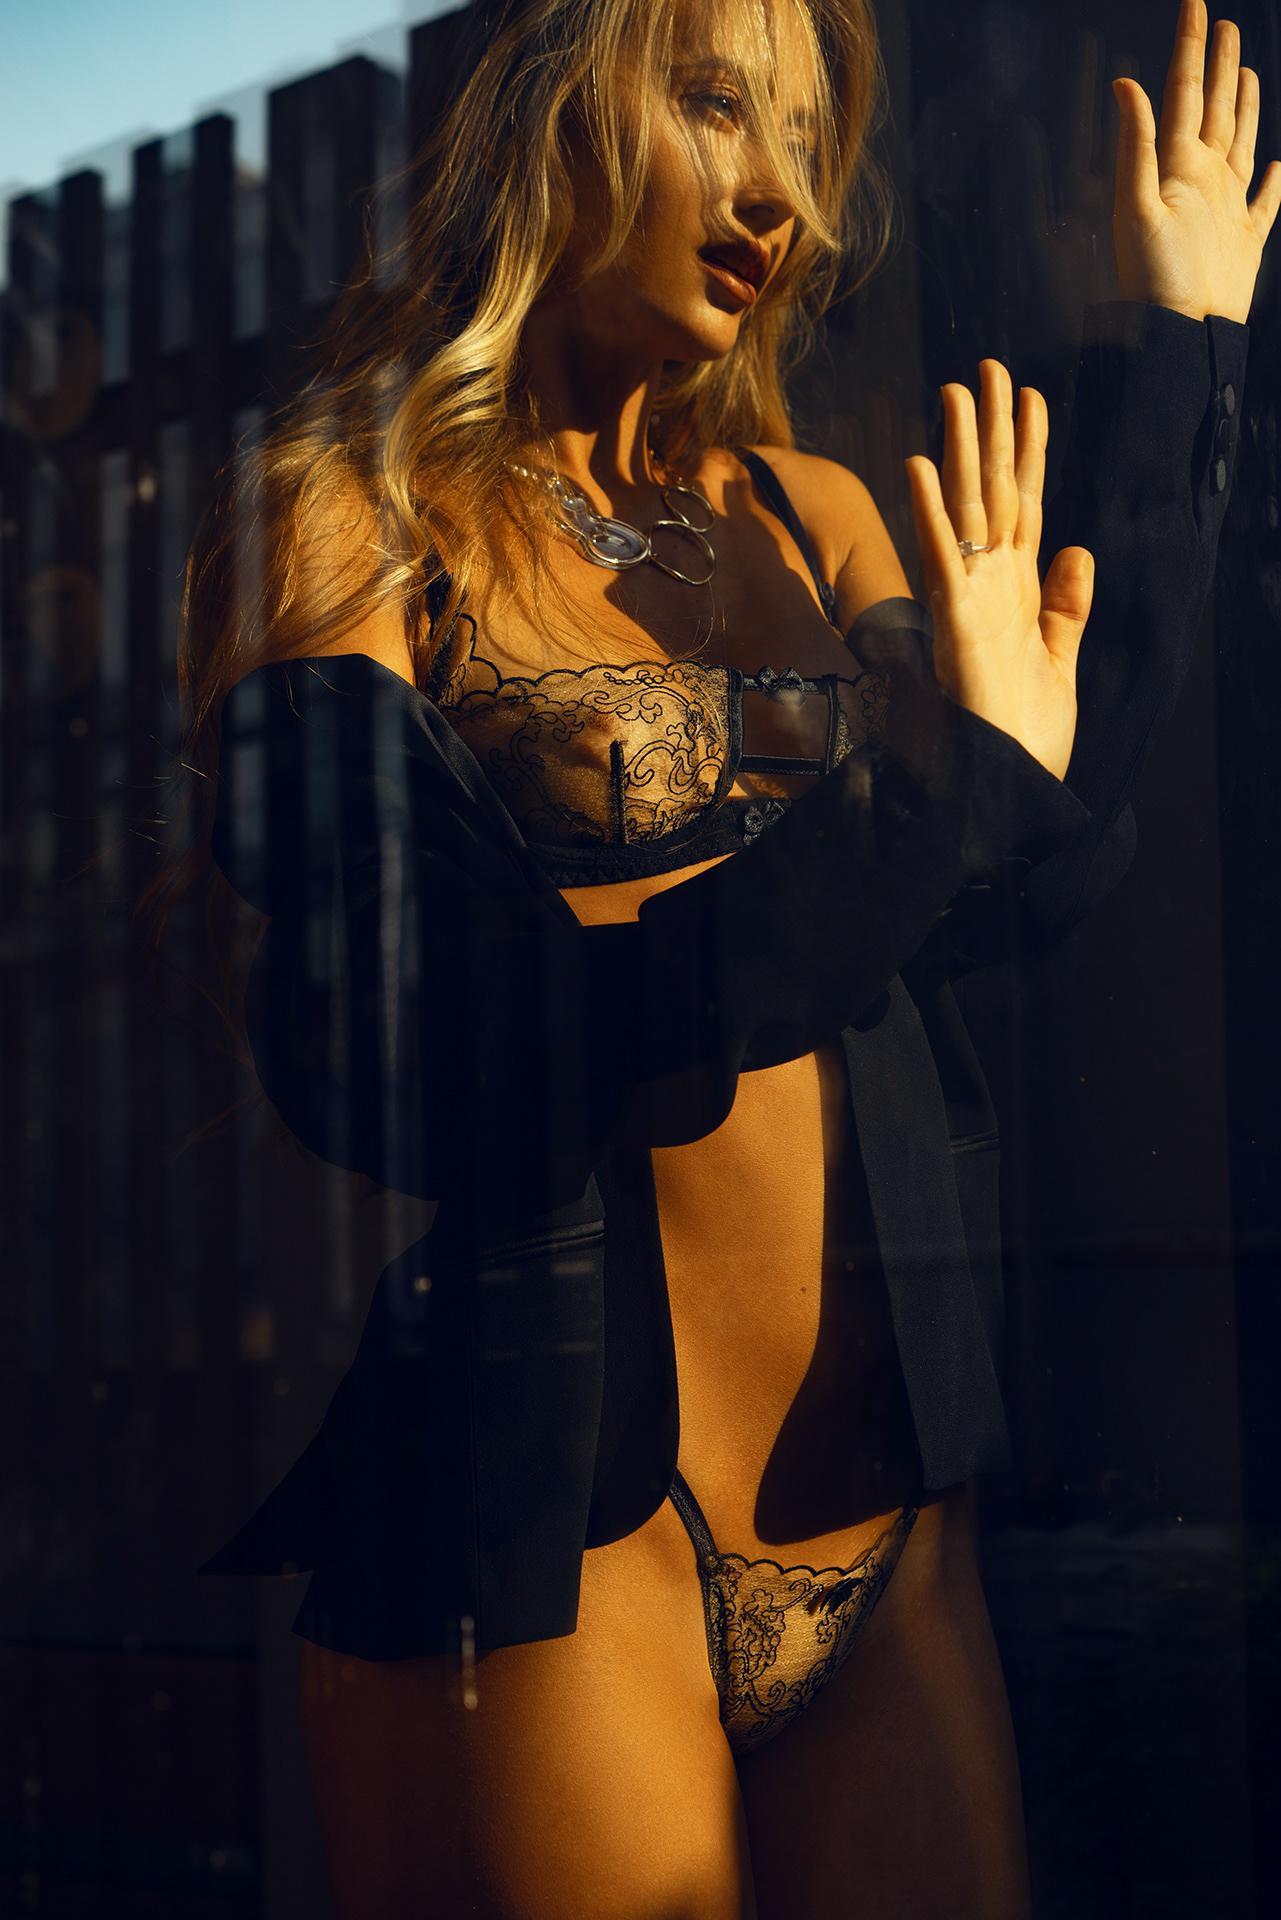 Lady Y / фотограф Артур Каплун